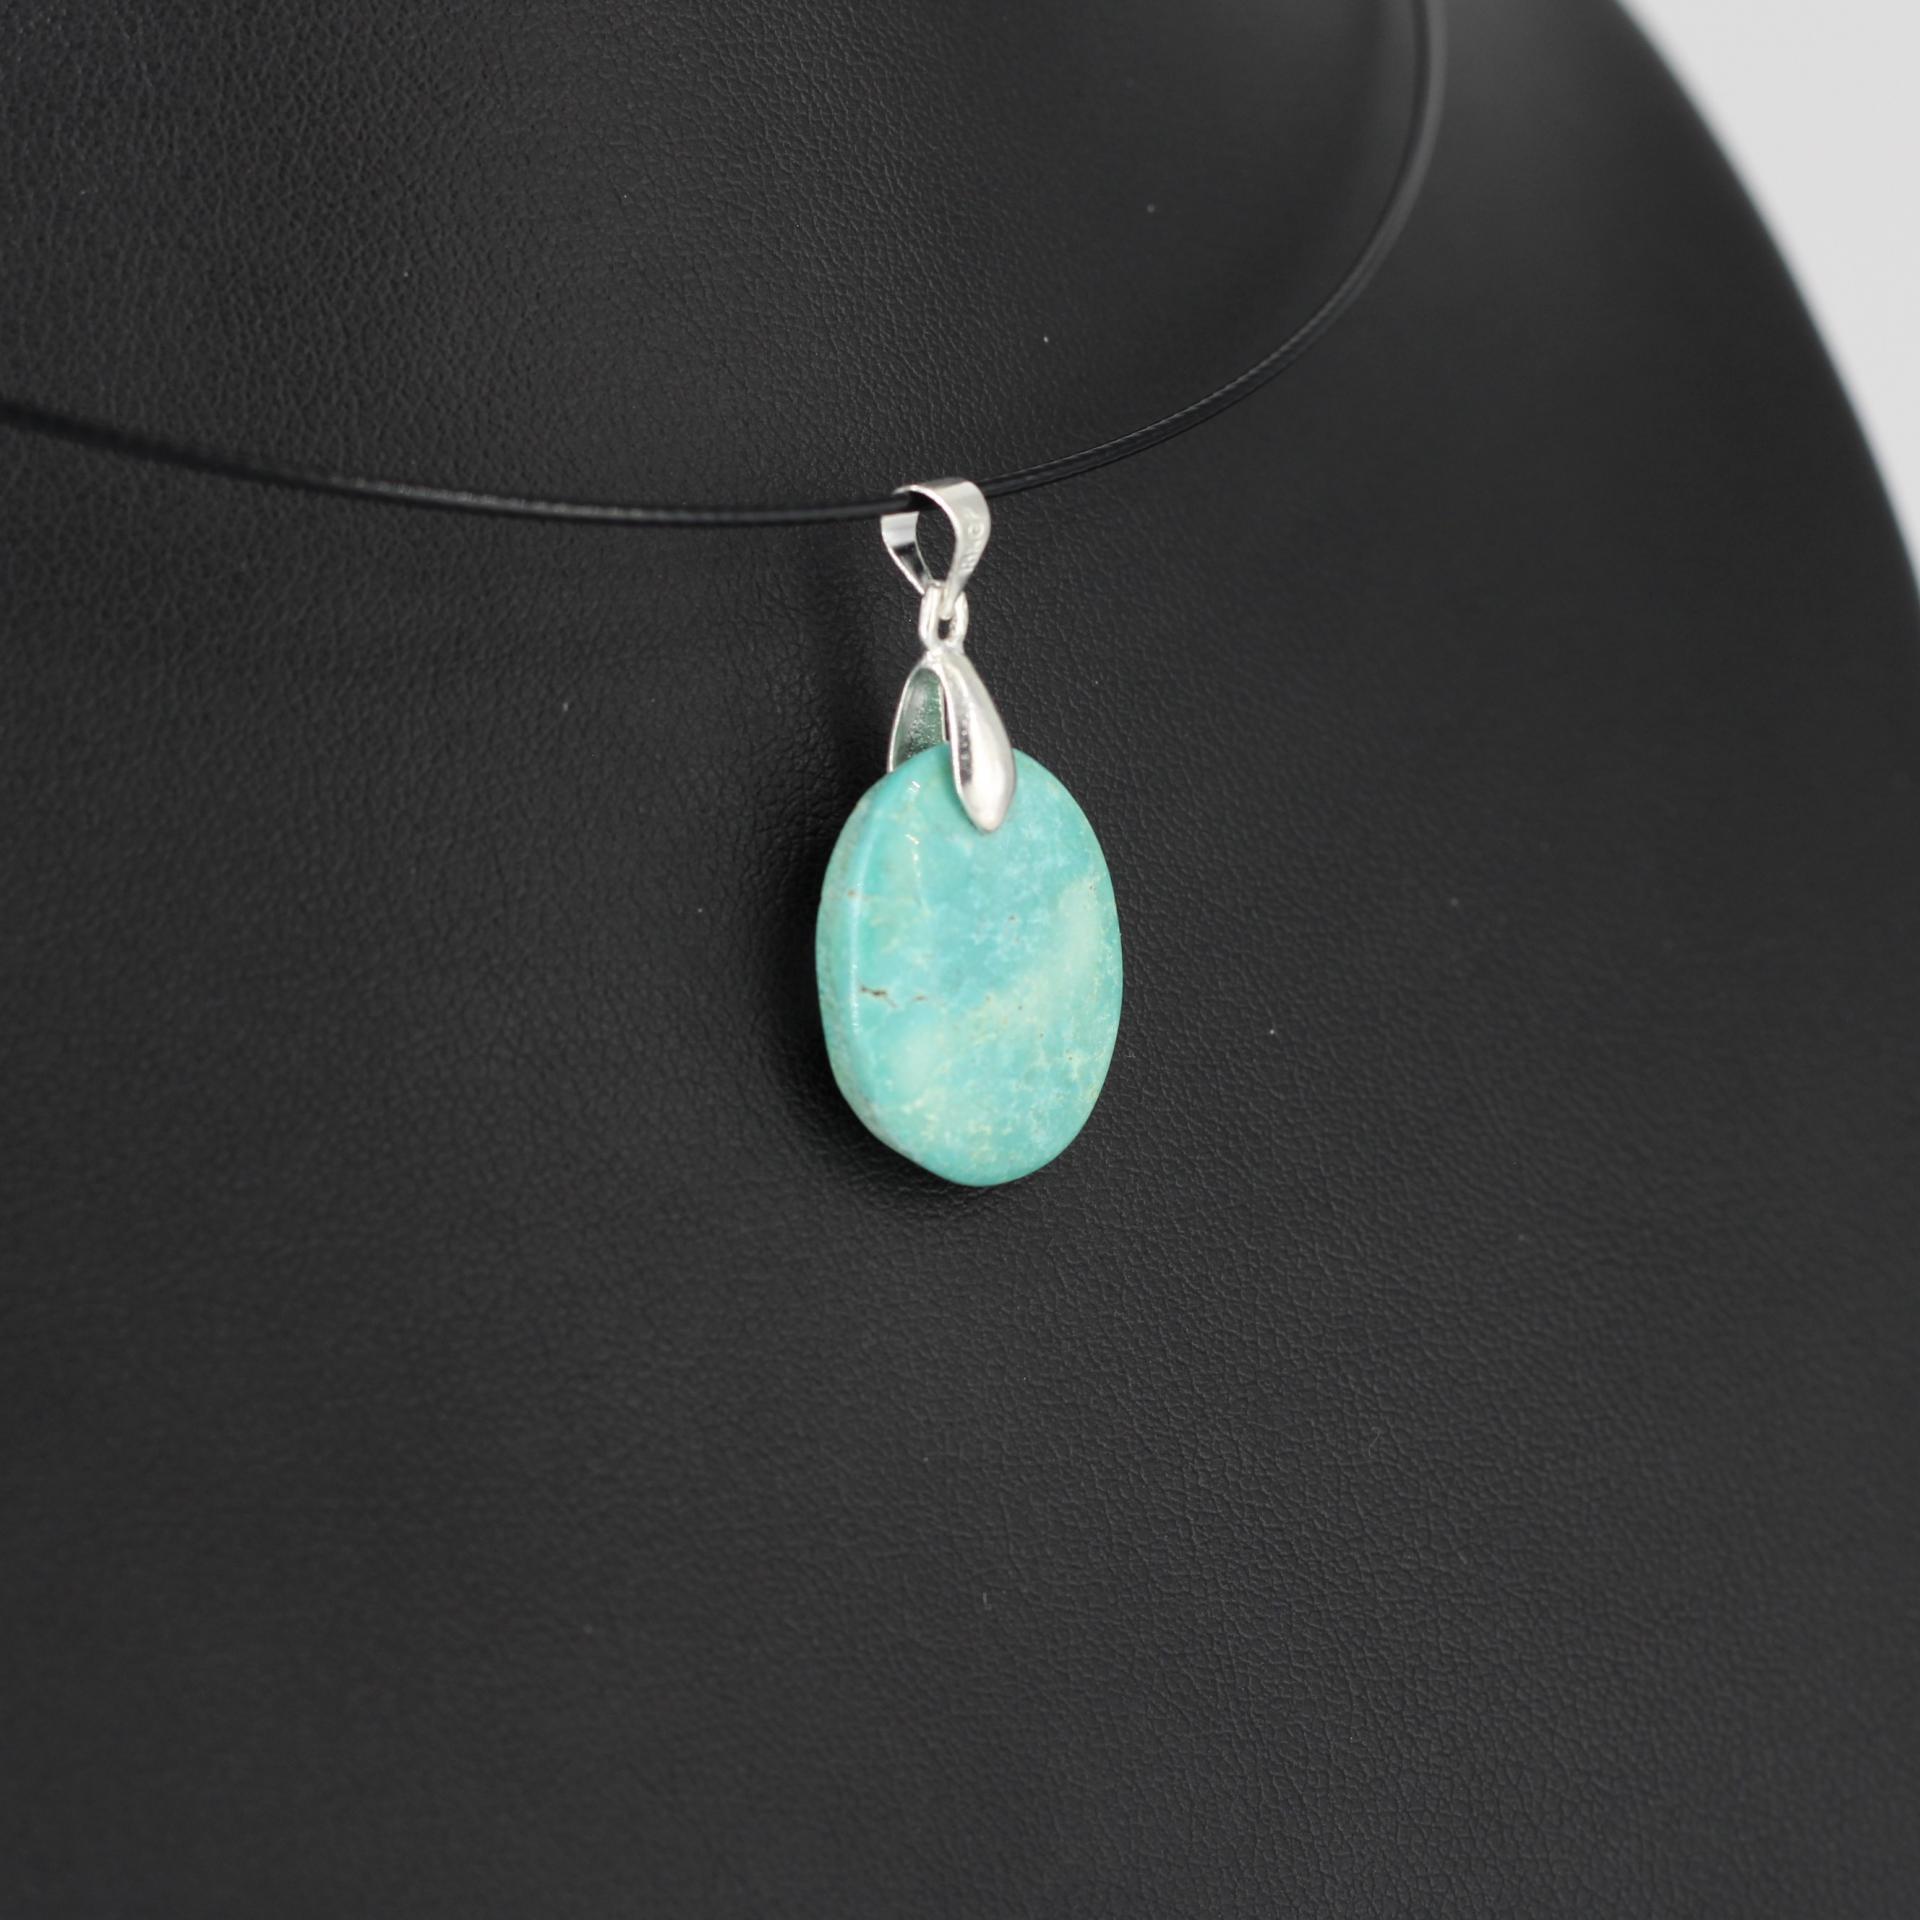 Turquoise m68 4